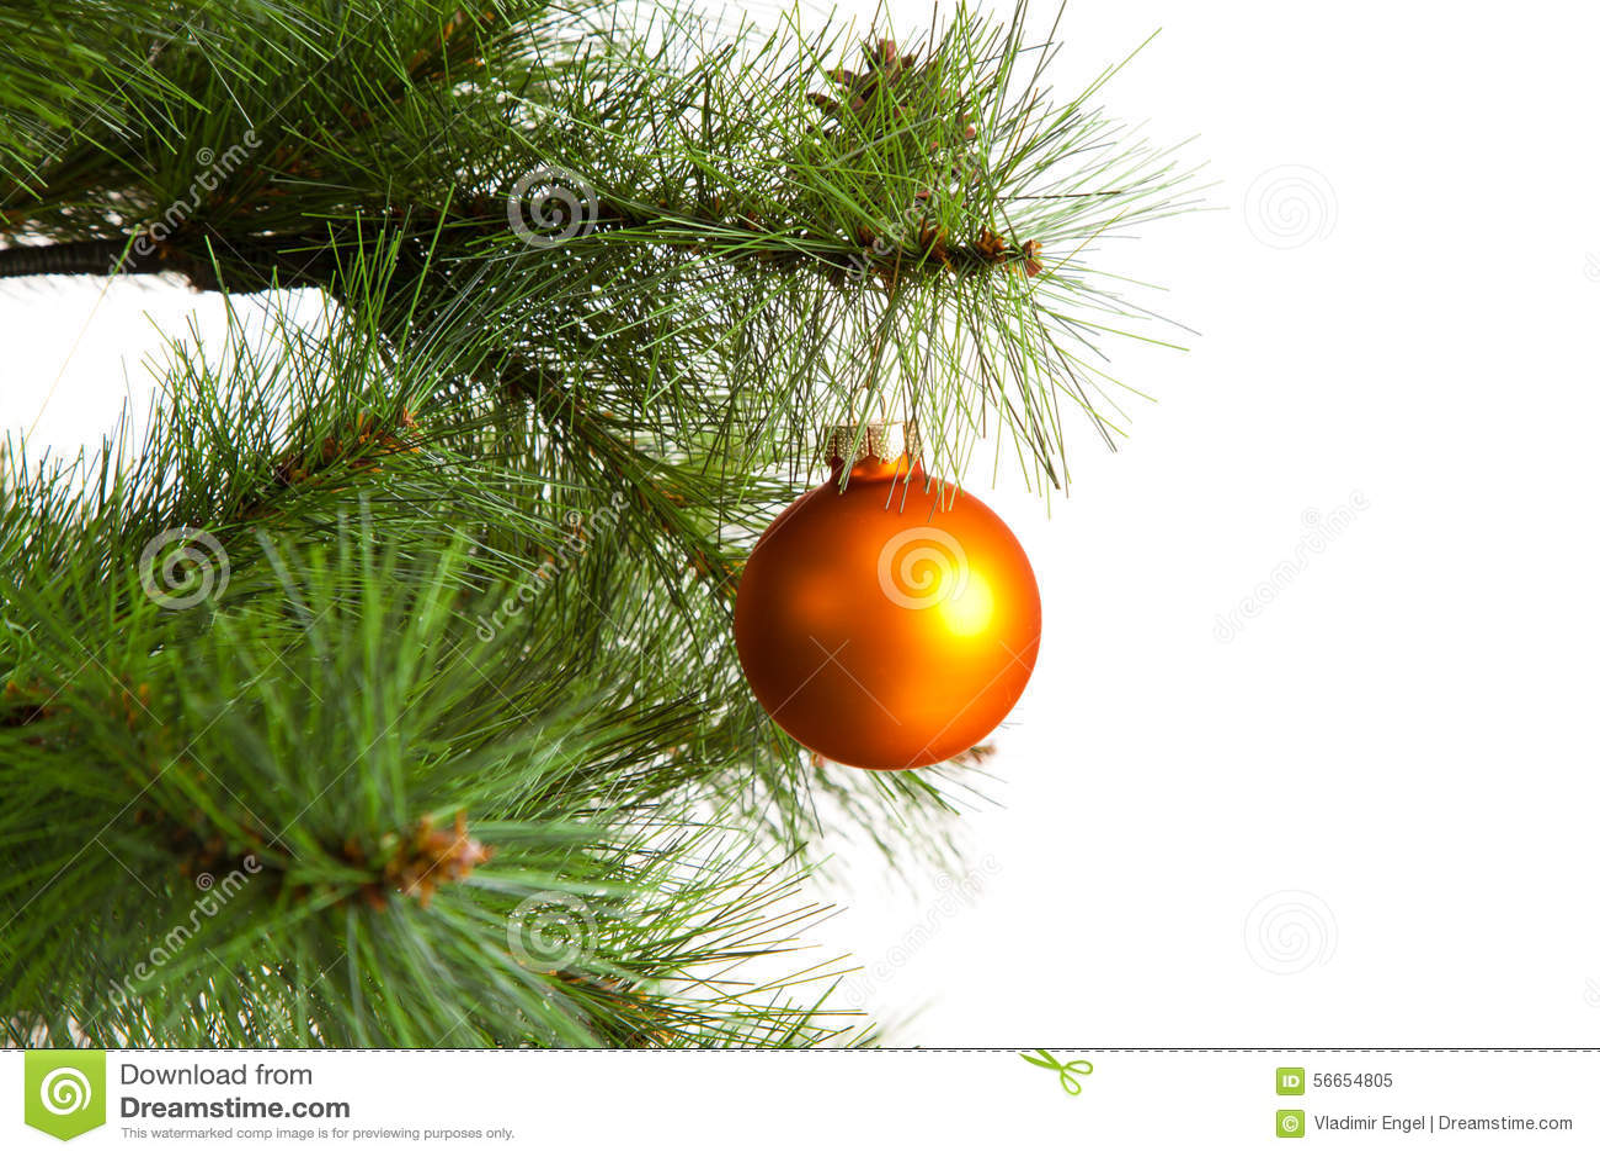 D corations de no l arbre 2016 nouvelles ann es photo - Decoration arbre de noel ...